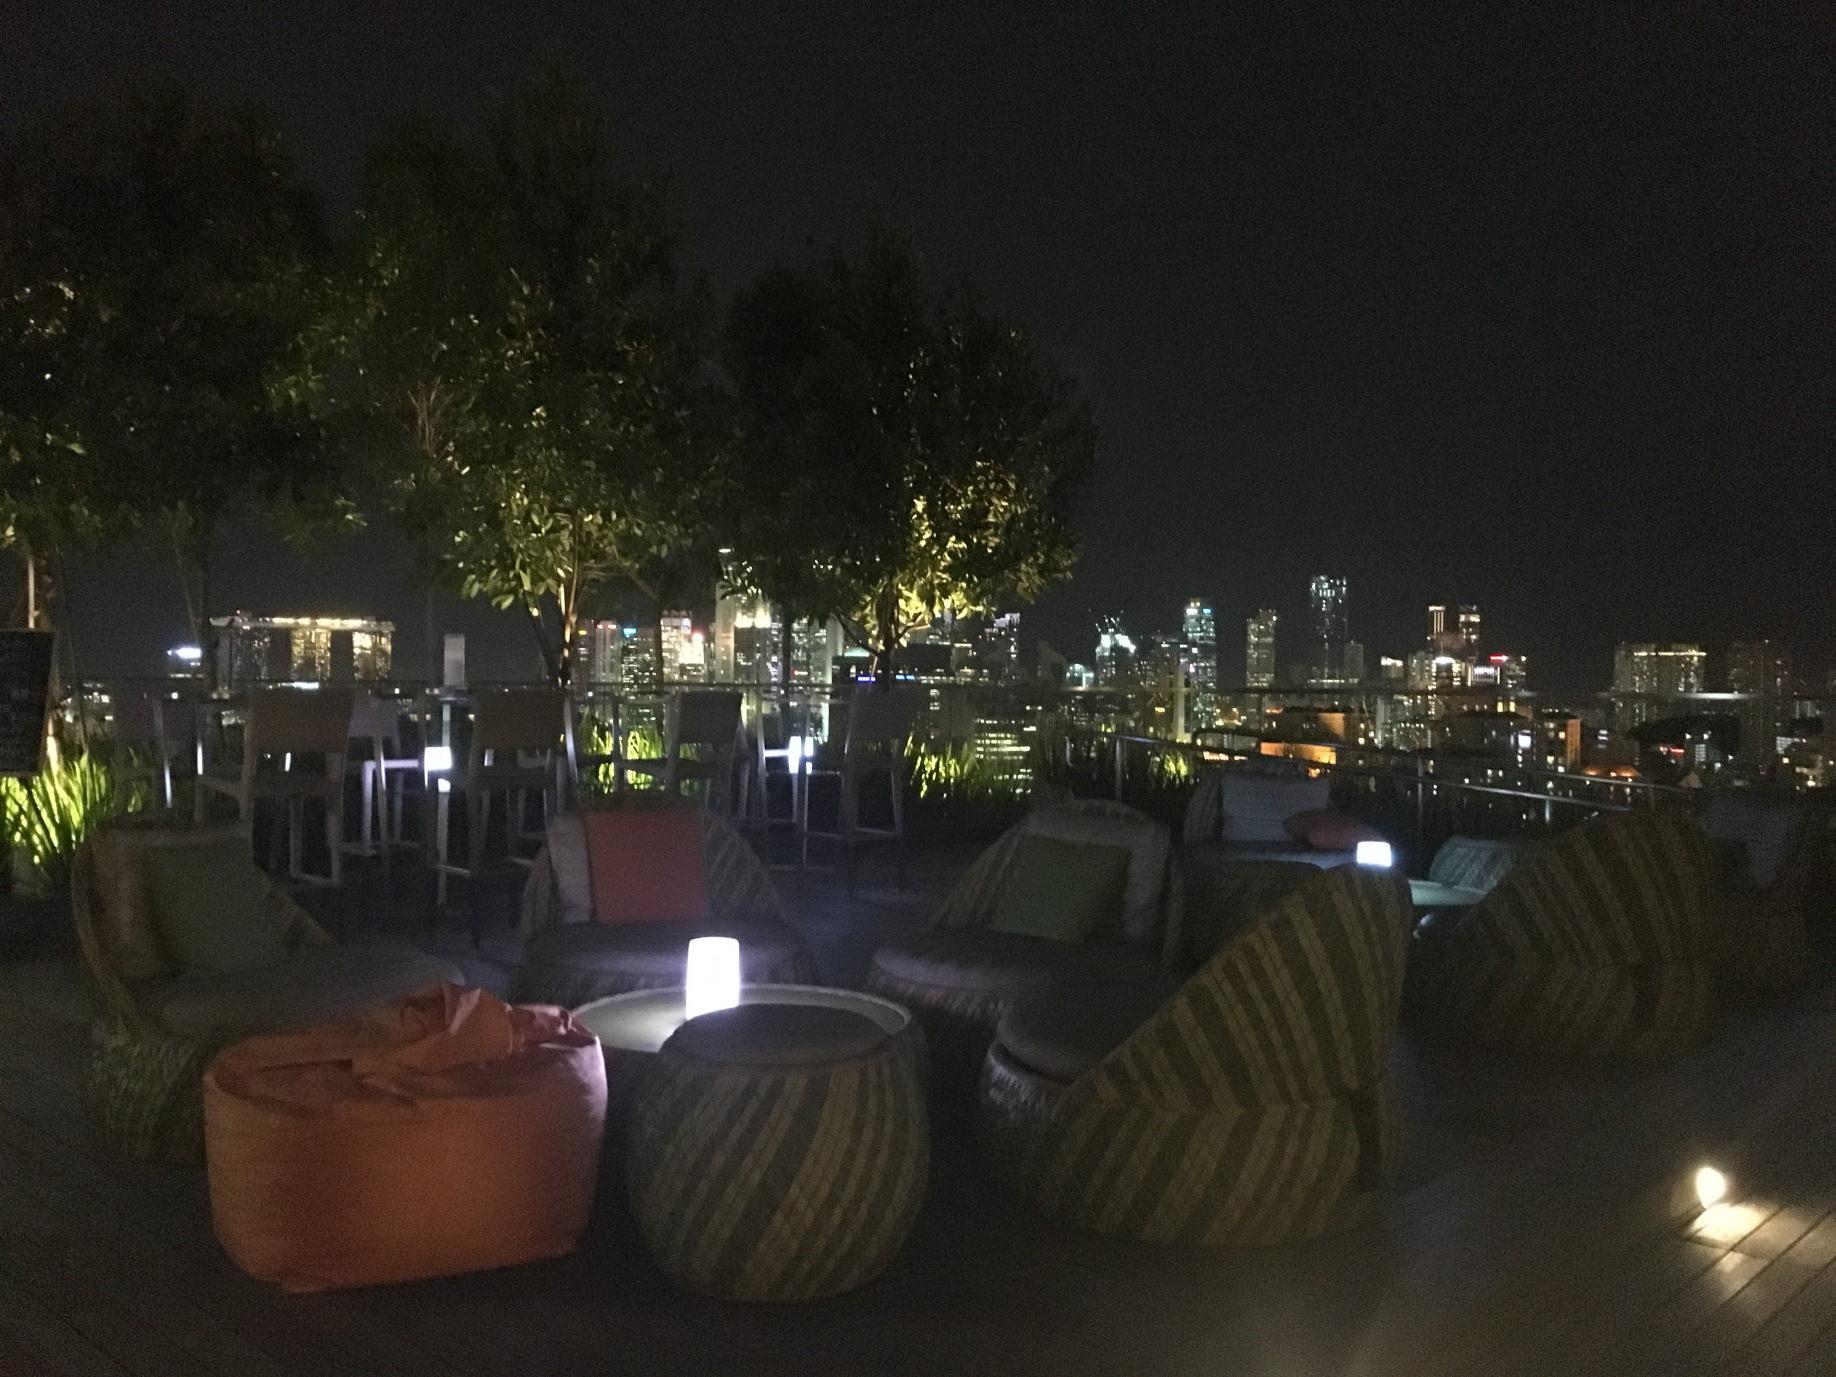 Dachterrasse des Hotel Jen Orchadgateway